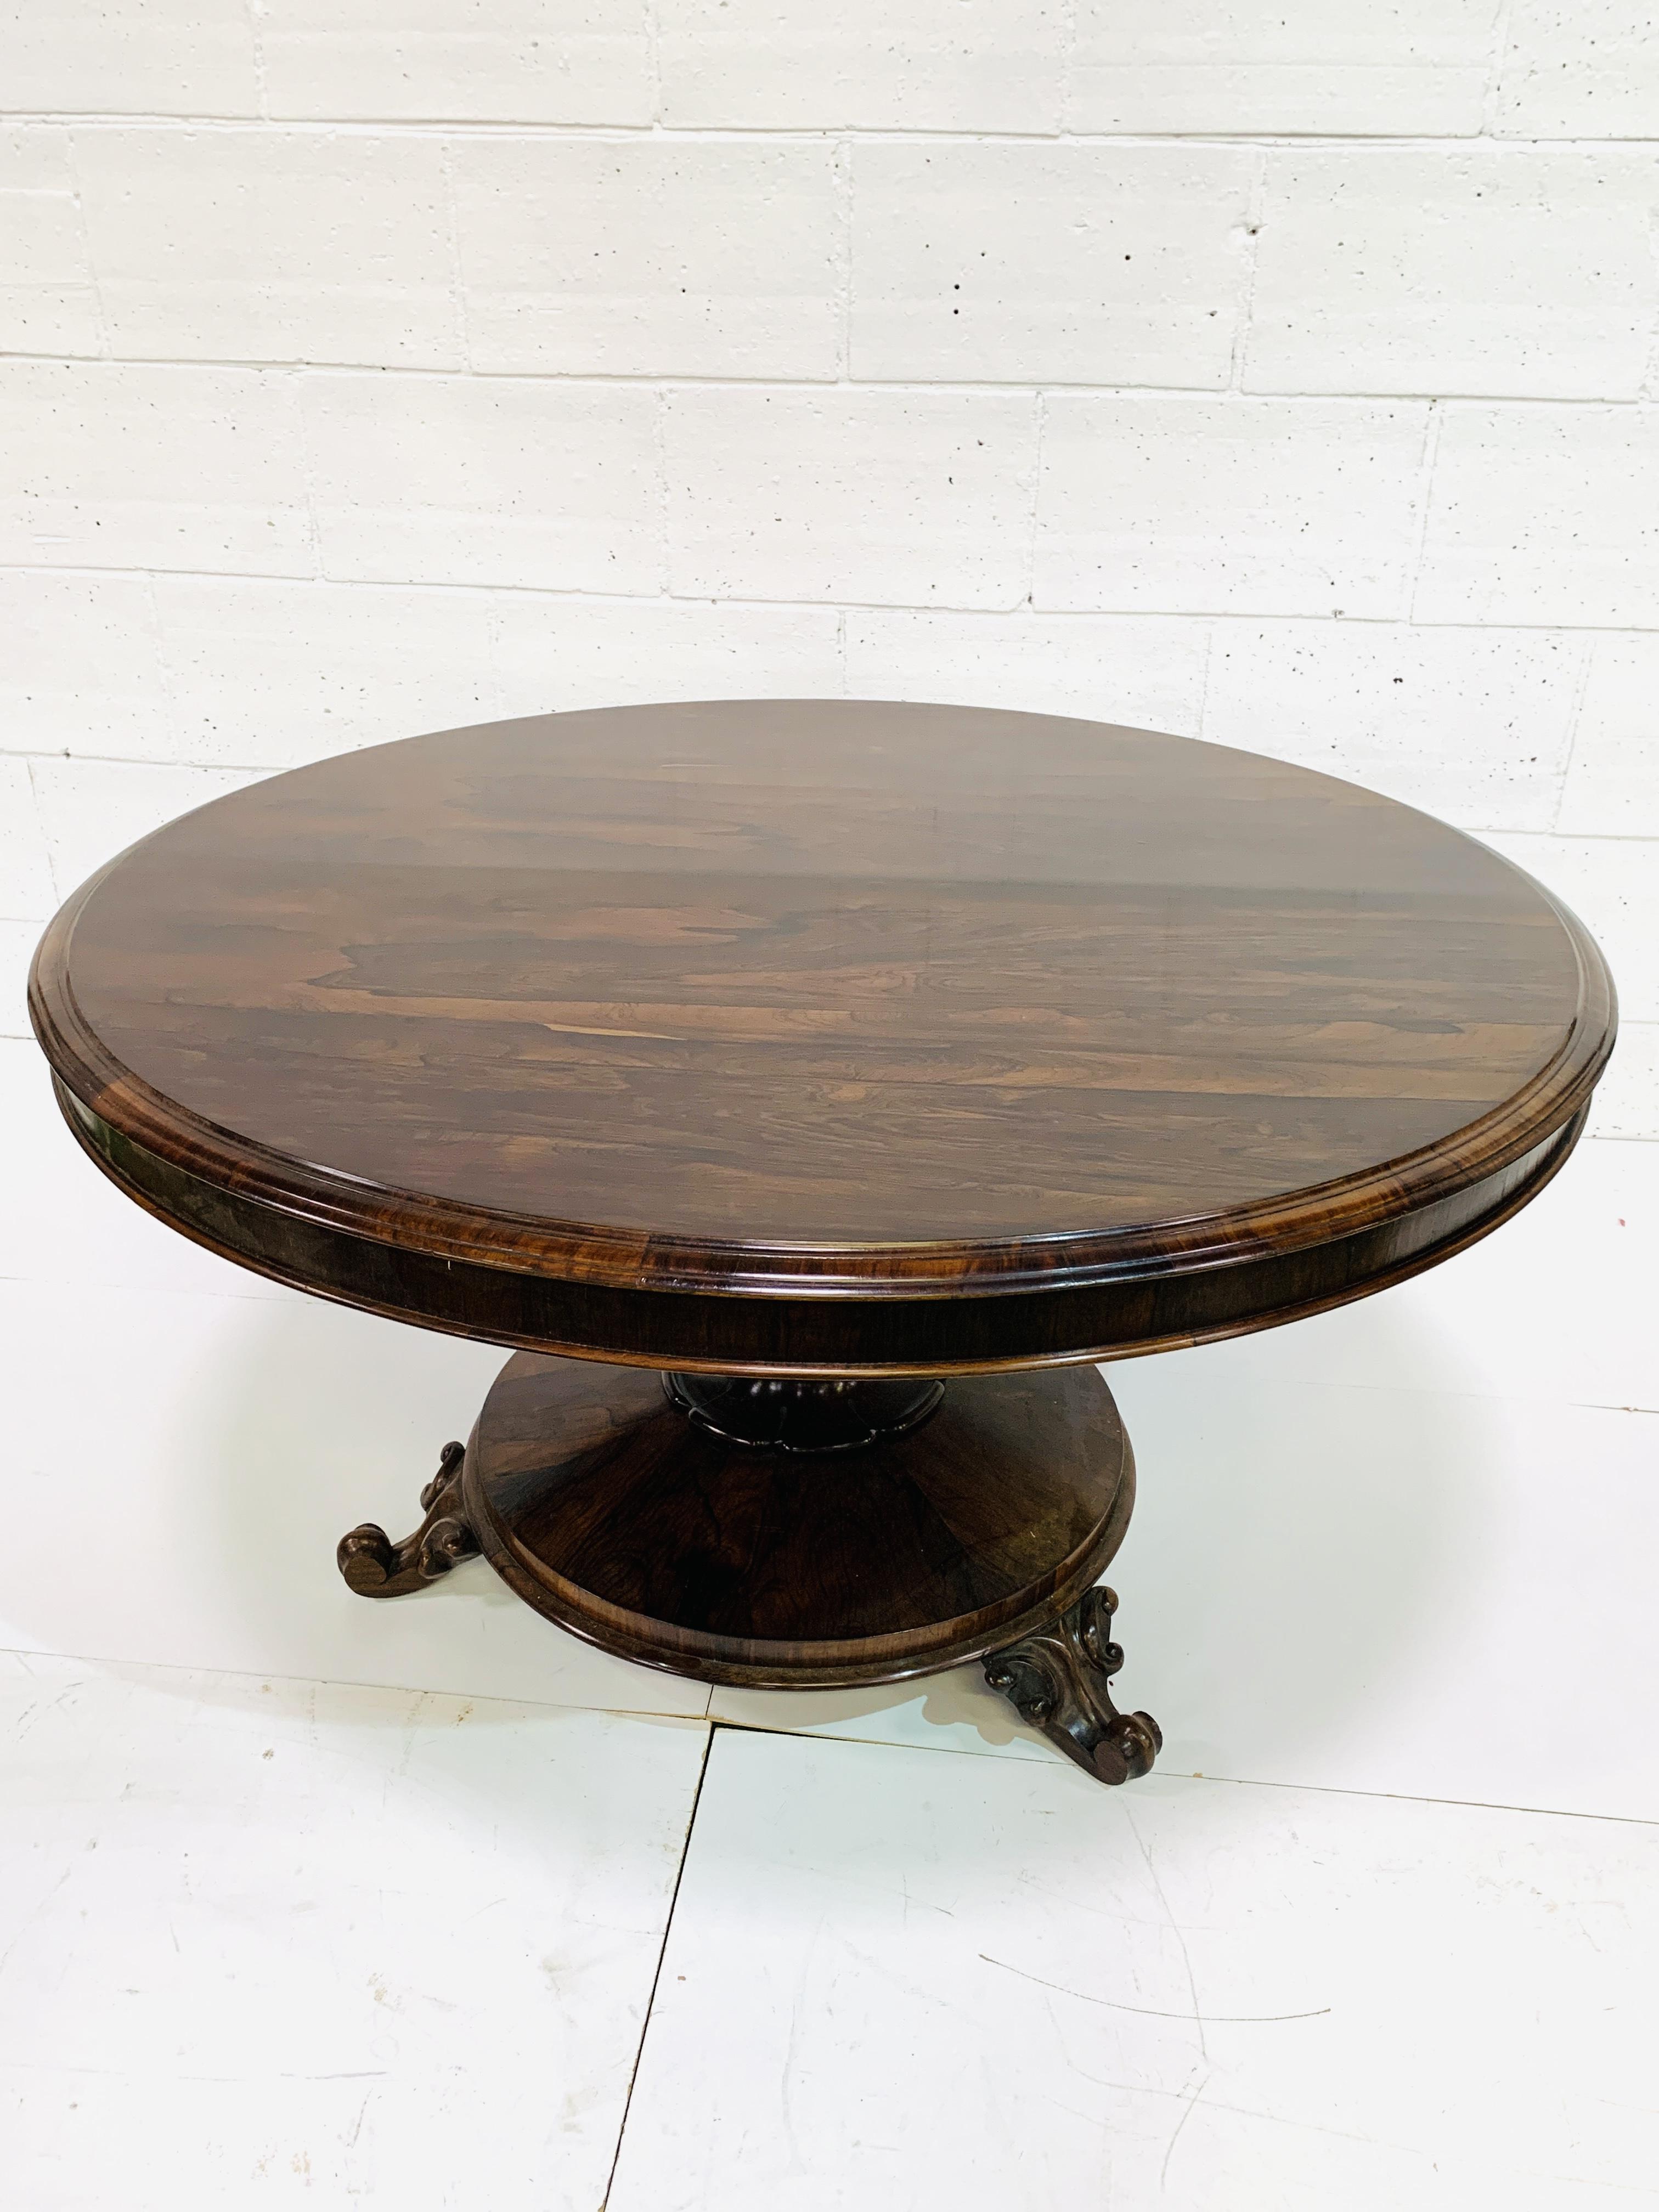 Victorian circular Rosewood tilt top table - Image 6 of 9